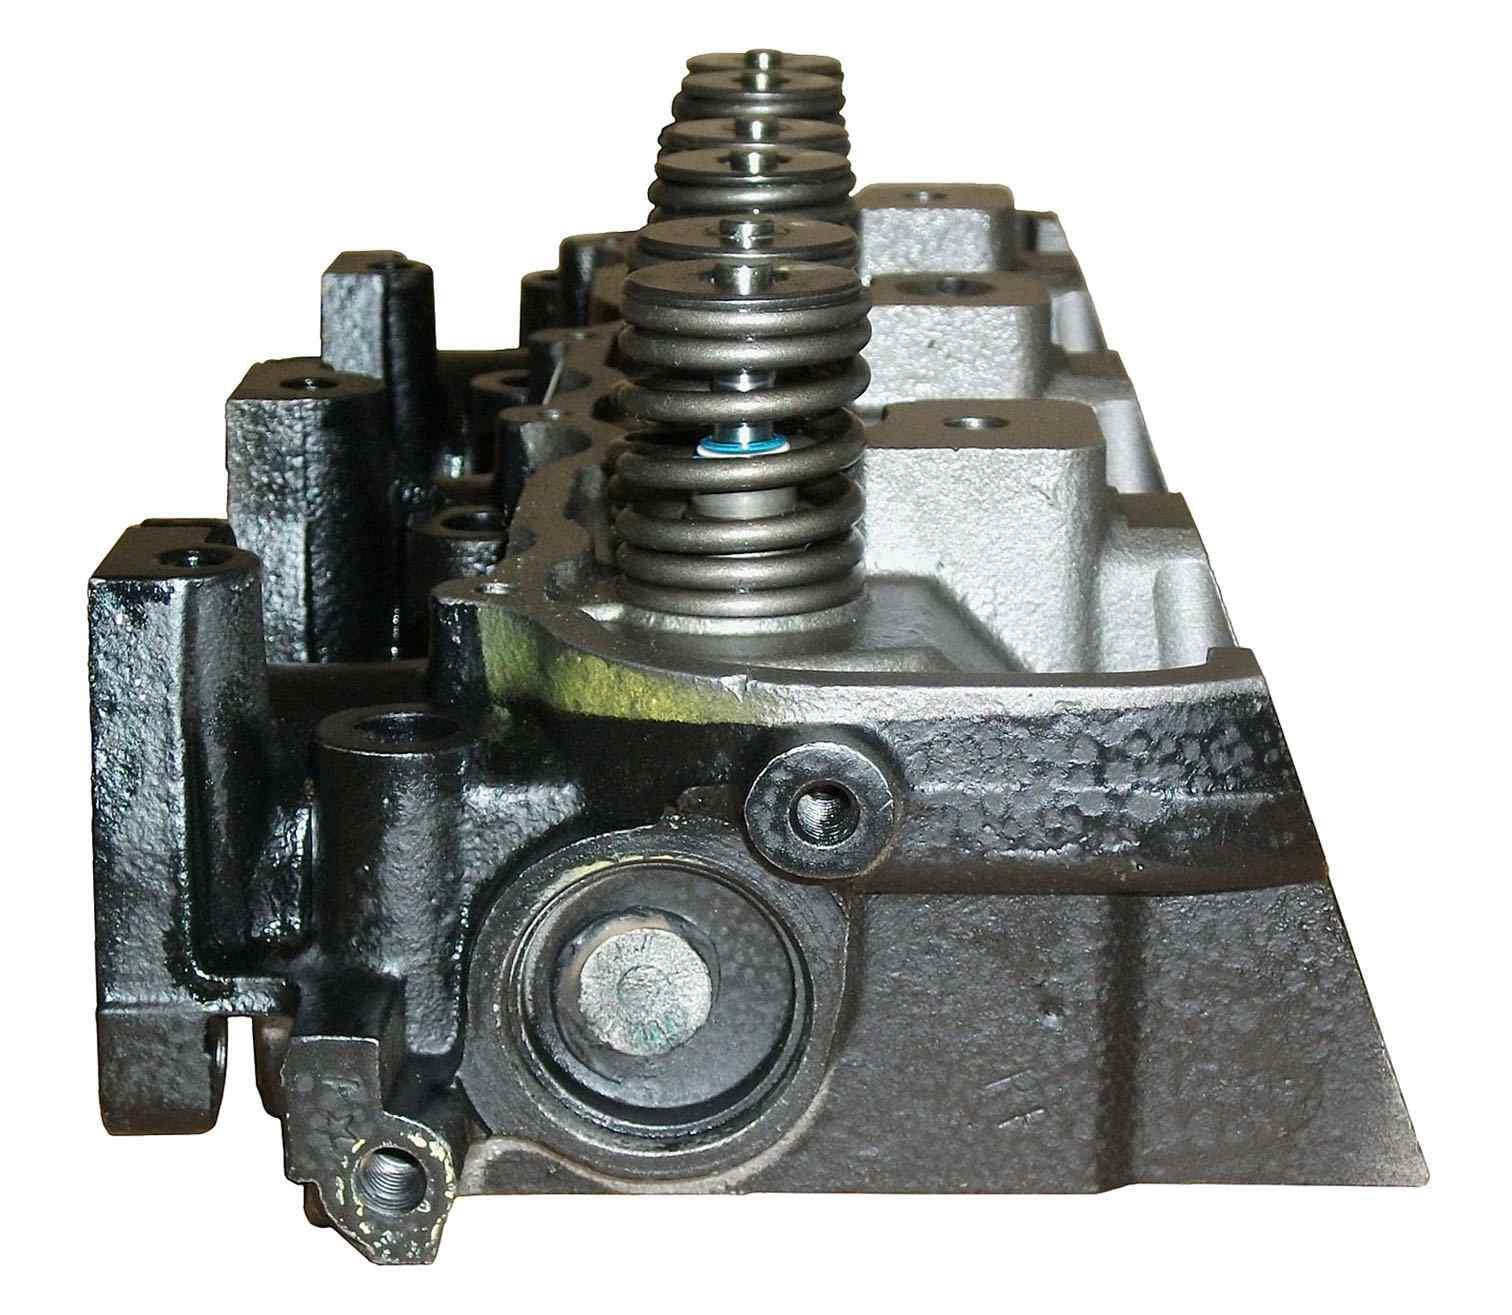 Ford Ranger 2000 Remanufactured Cylinder Head: Engine Cylinder Head ATK North America 2FA7 Reman Fits 86